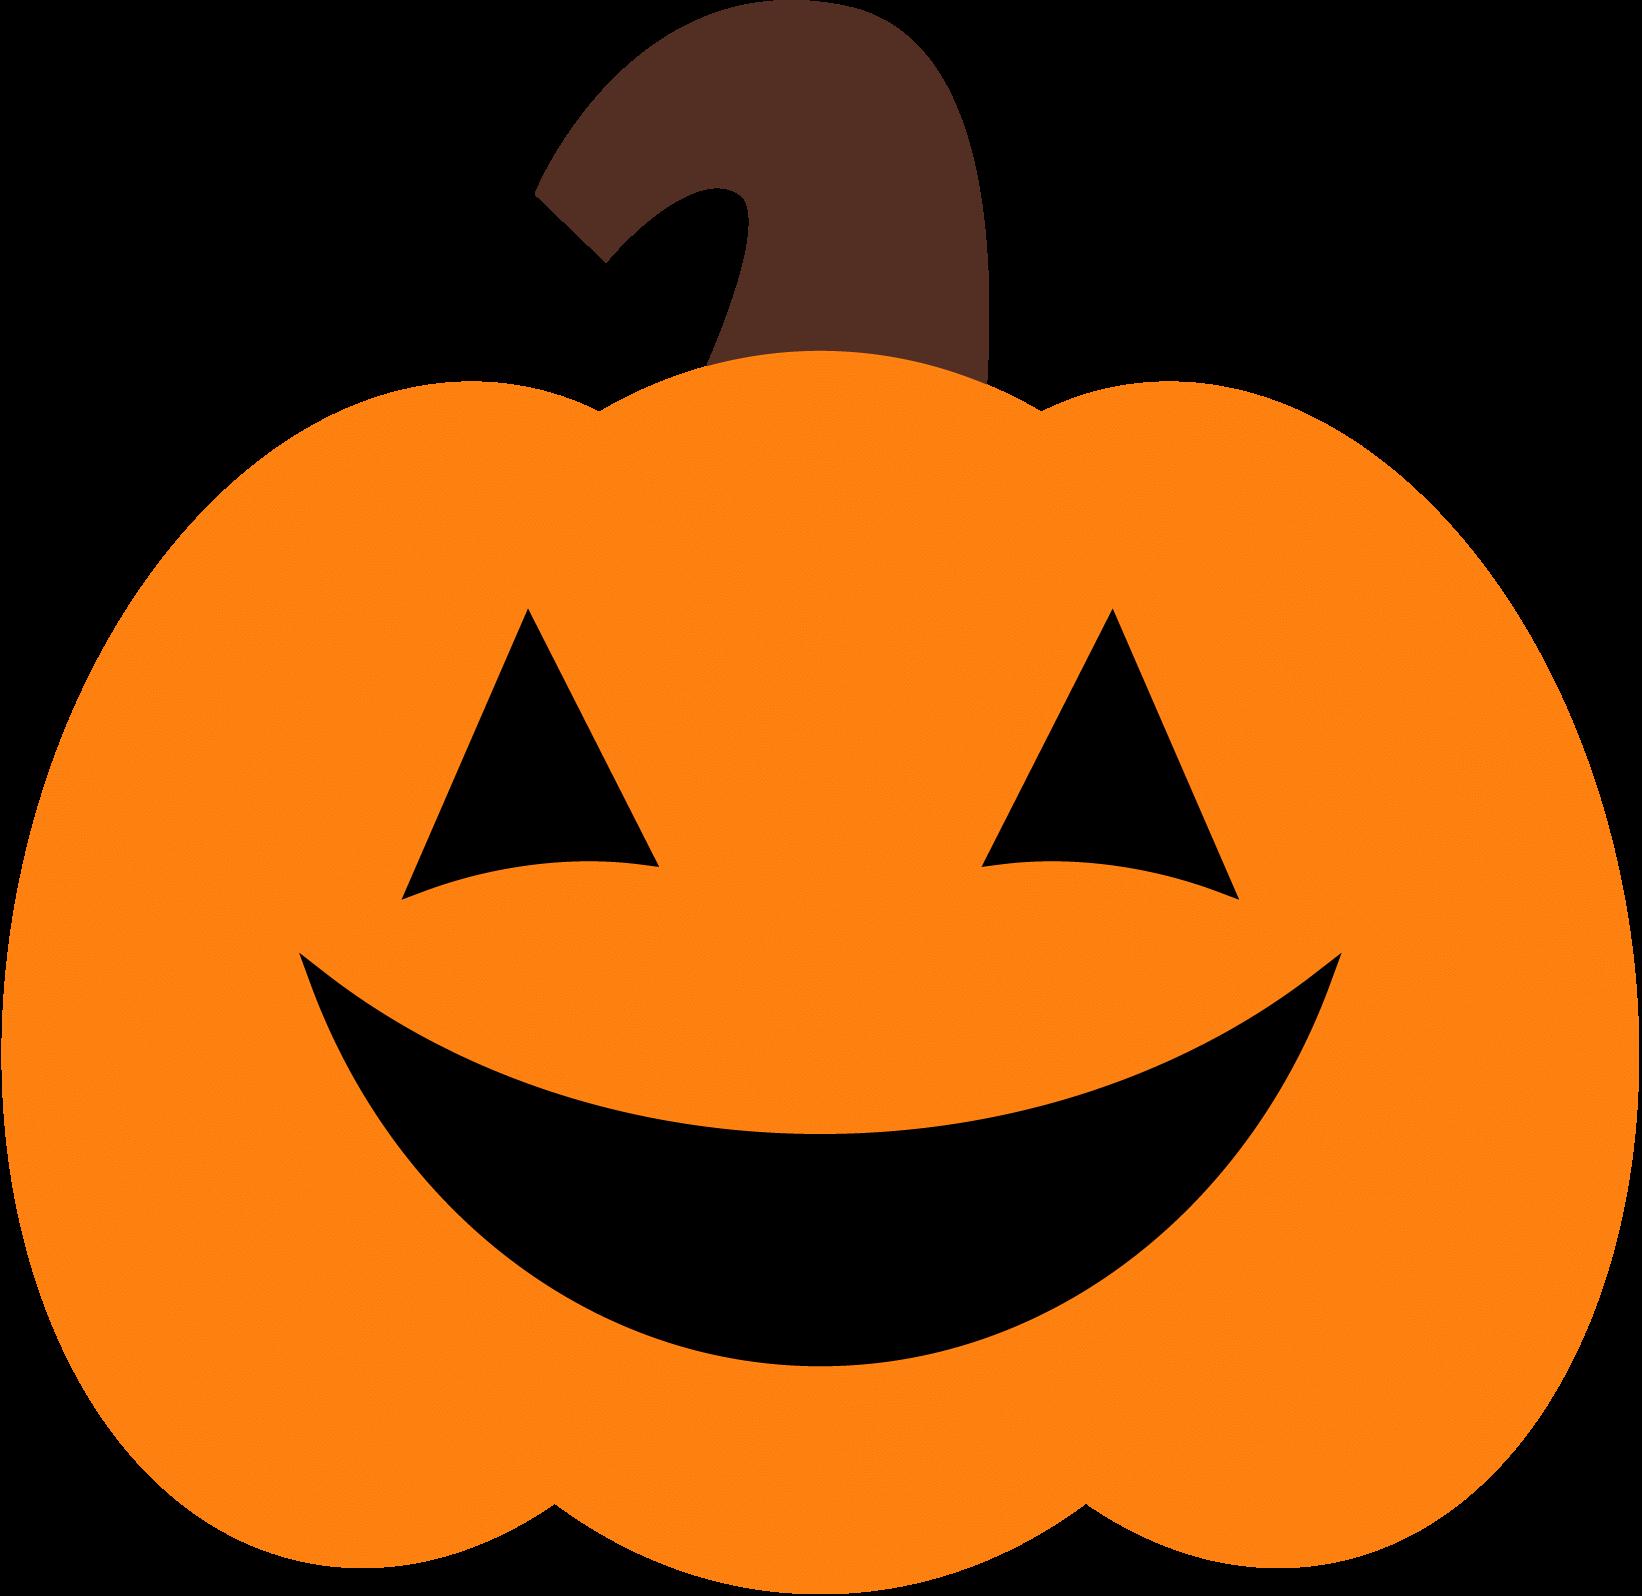 Glasses clipart halloween. Nerd cliparts zone pumpkin